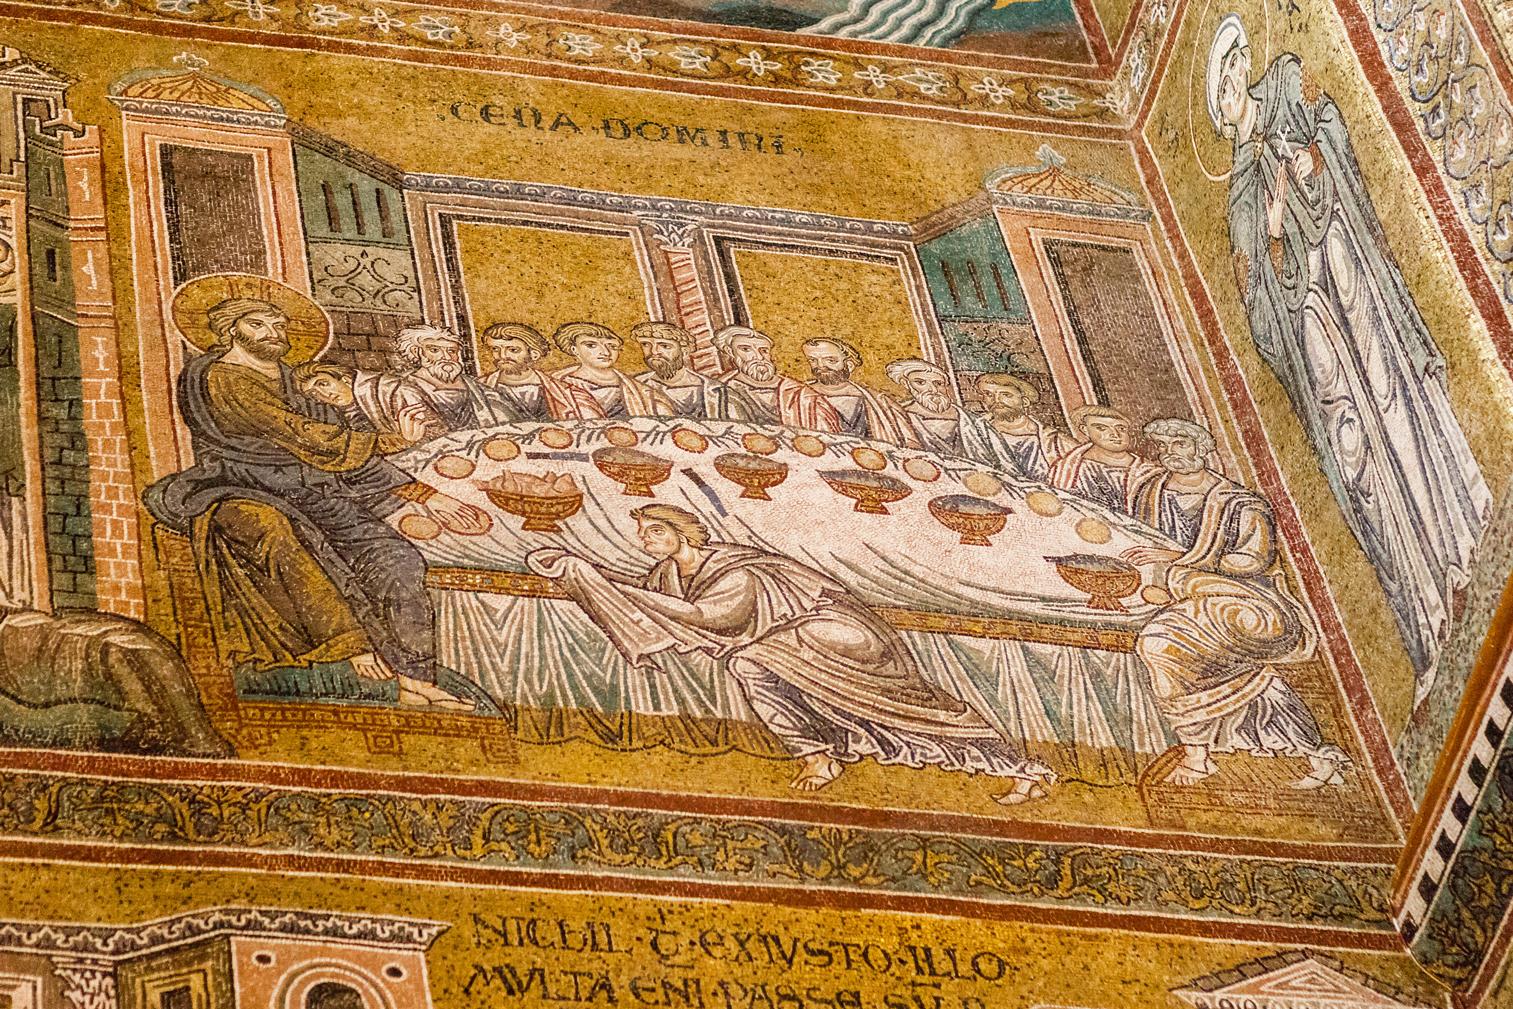 Laatste avondmaal in Cappella Palatina in Palermo